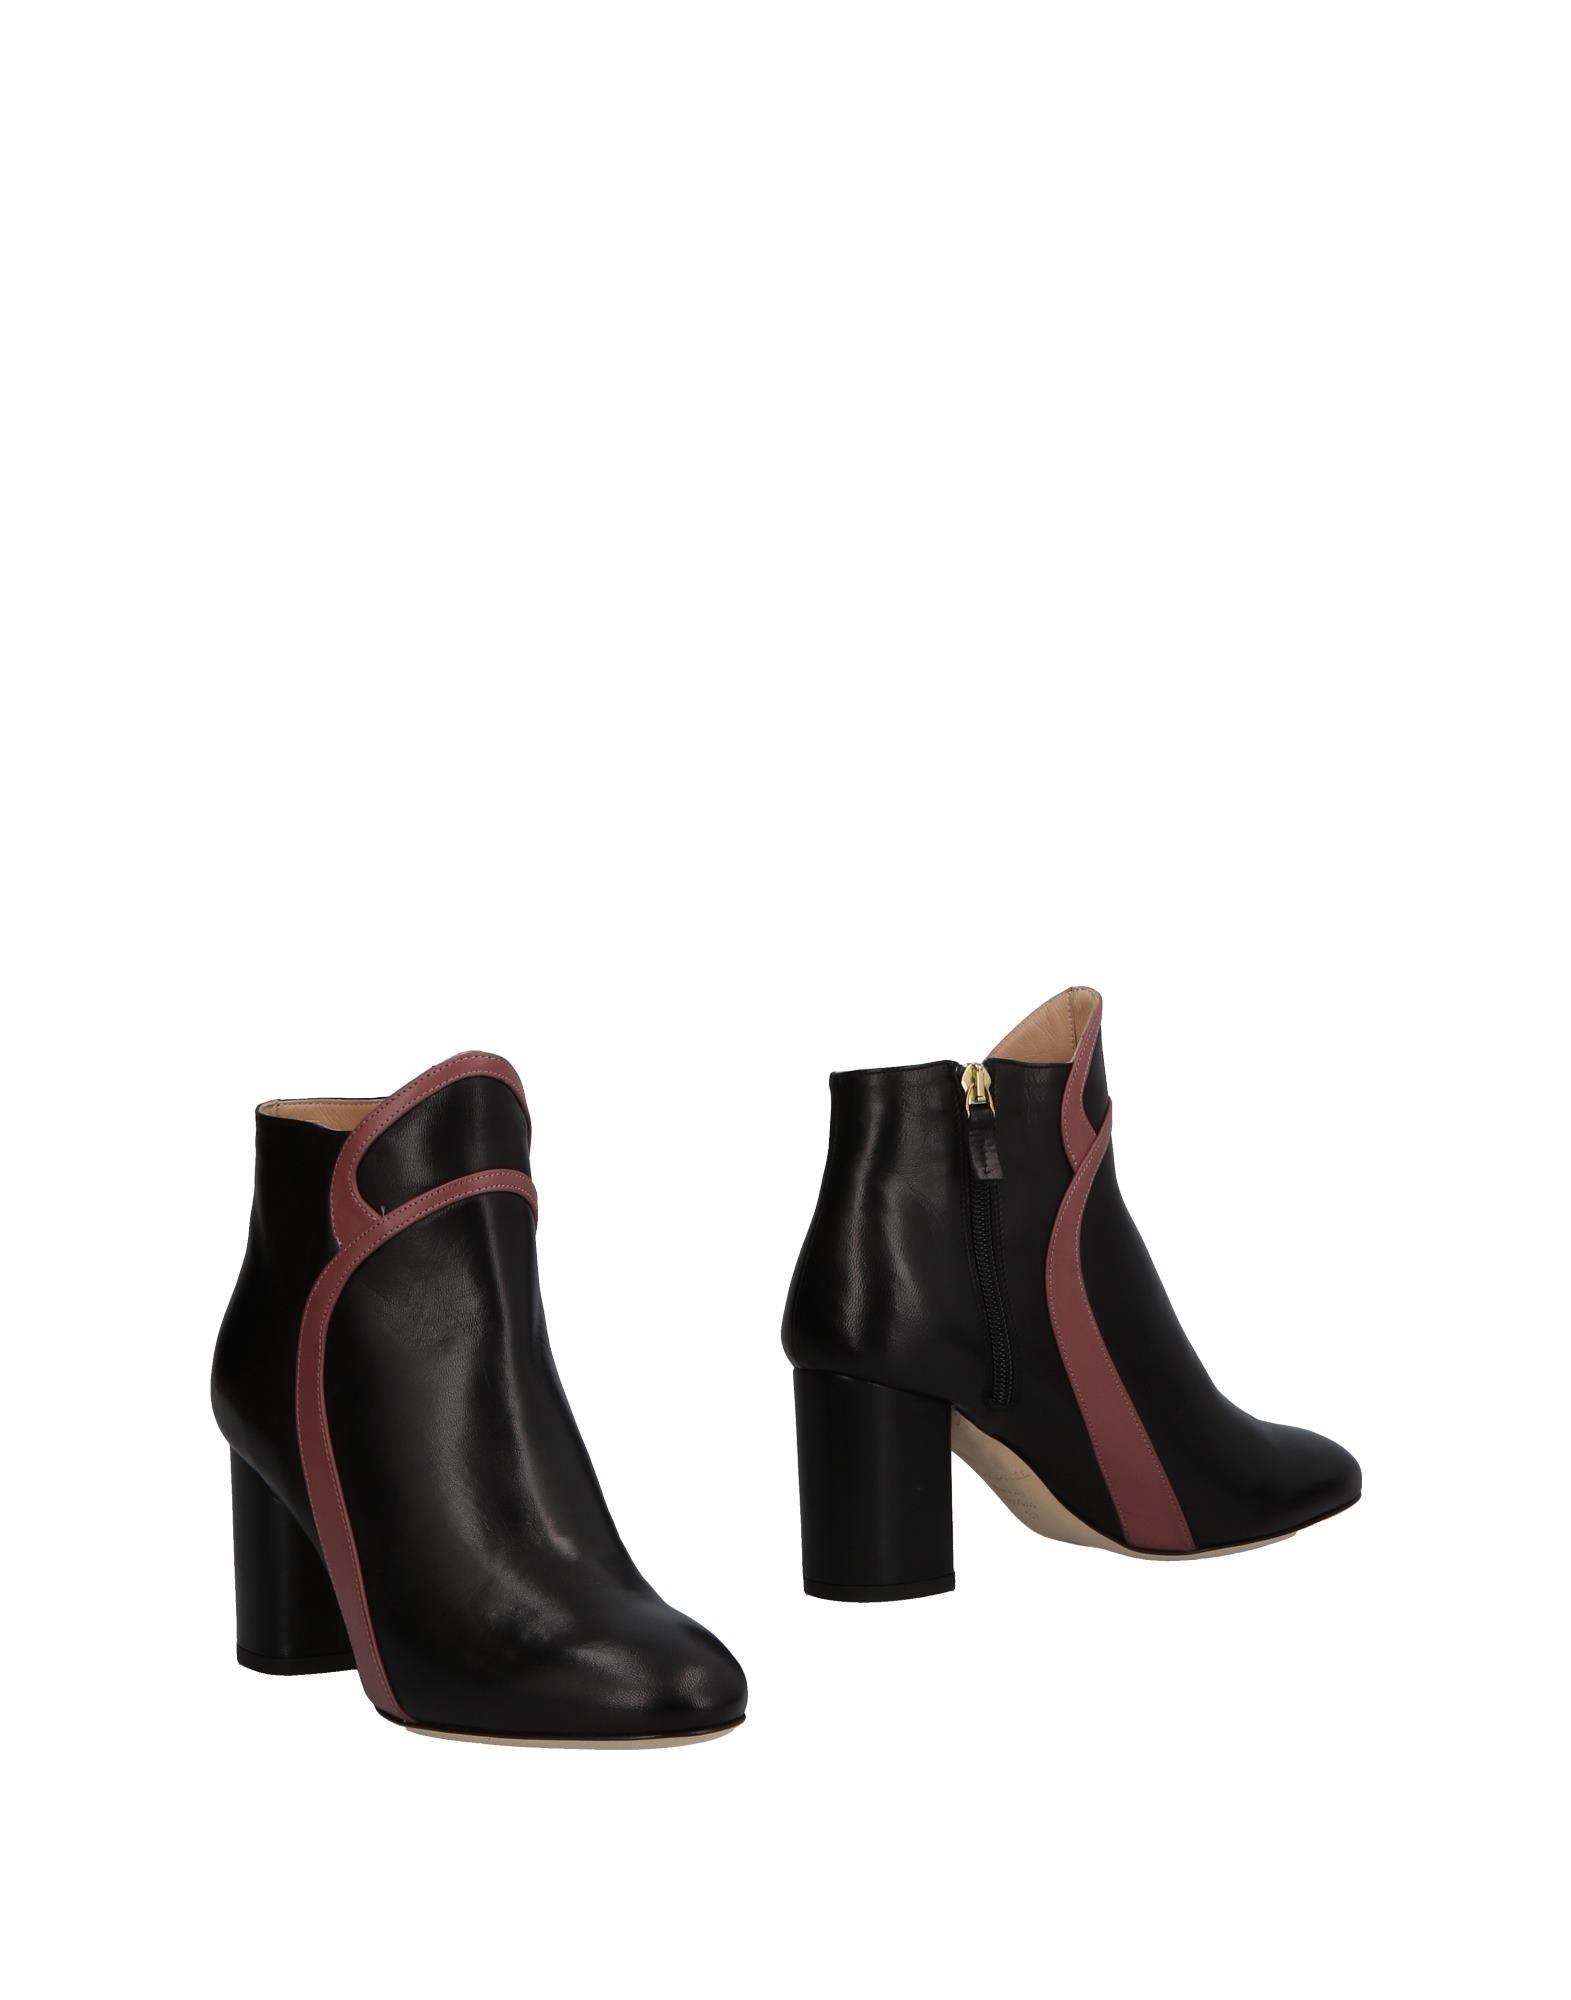 Racine Carrée Stiefelette Damen Schuhe  11492062UHGünstige gut aussehende Schuhe Damen 55183f